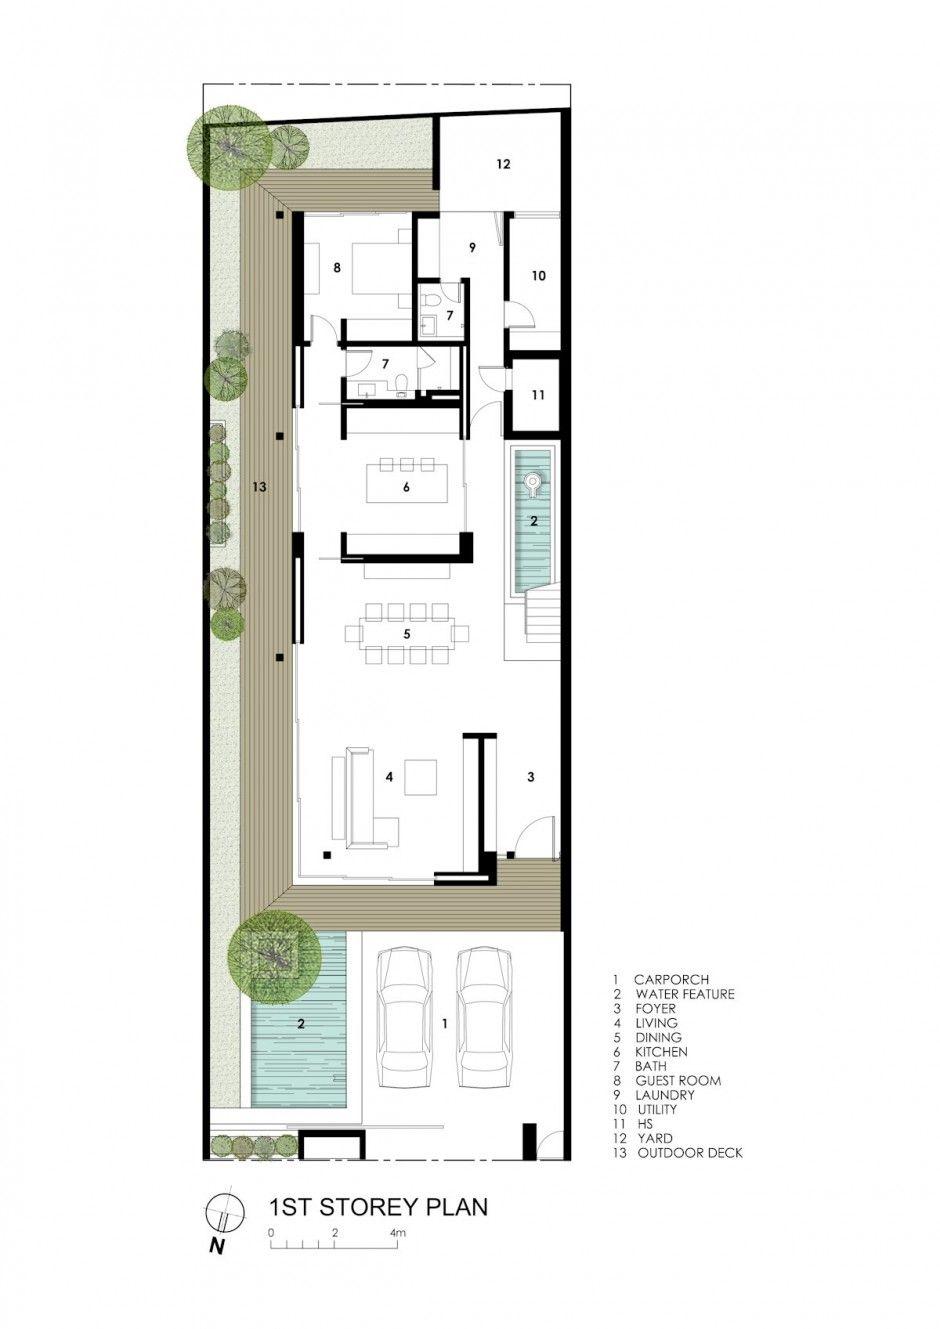 fs 090514 18 plan ion pinterest wohnhaus. Black Bedroom Furniture Sets. Home Design Ideas